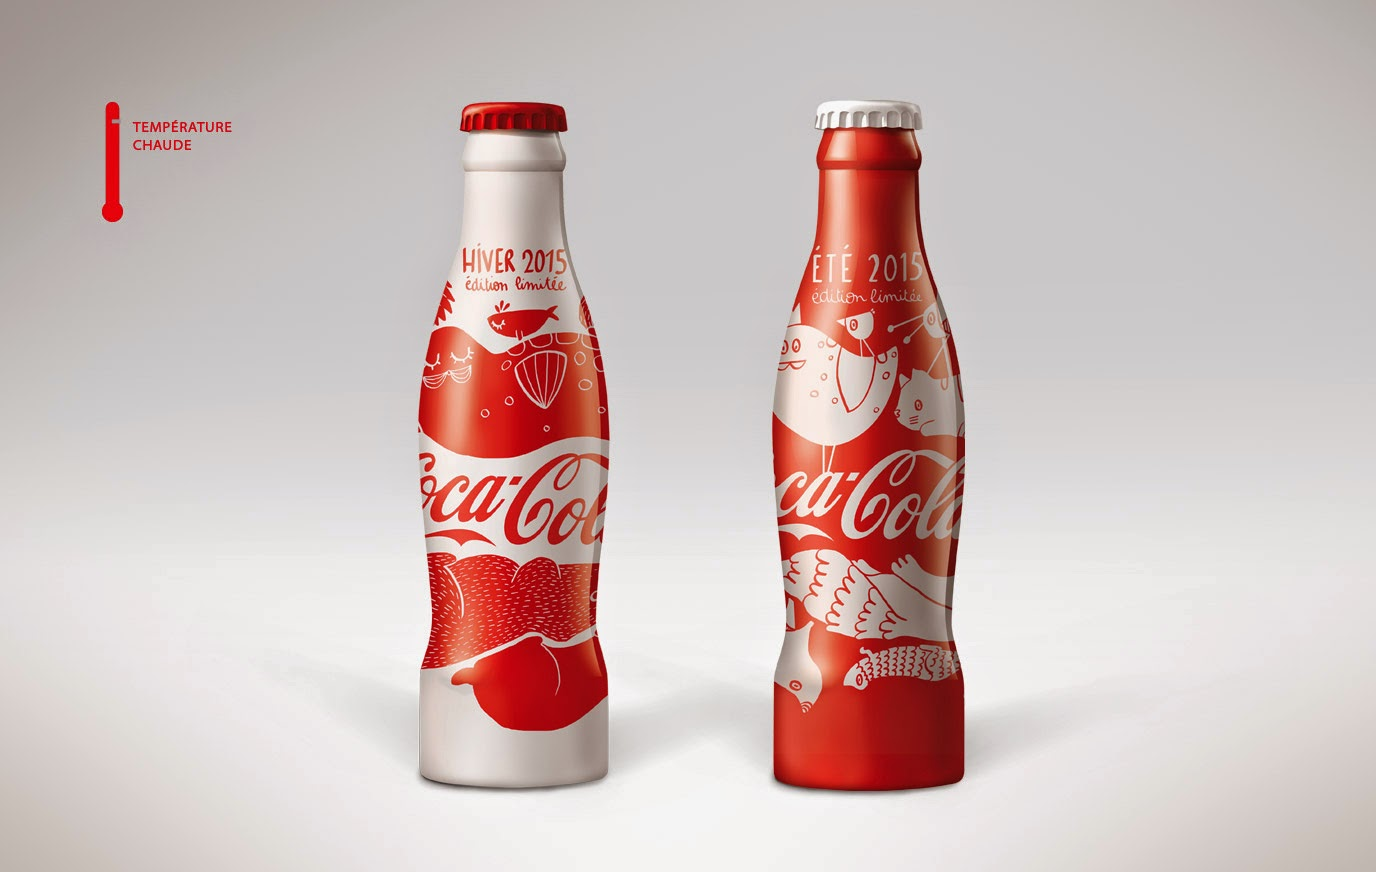 aluminum bottle collector club coca cola summer winter aluminum bottle 2015 france. Black Bedroom Furniture Sets. Home Design Ideas